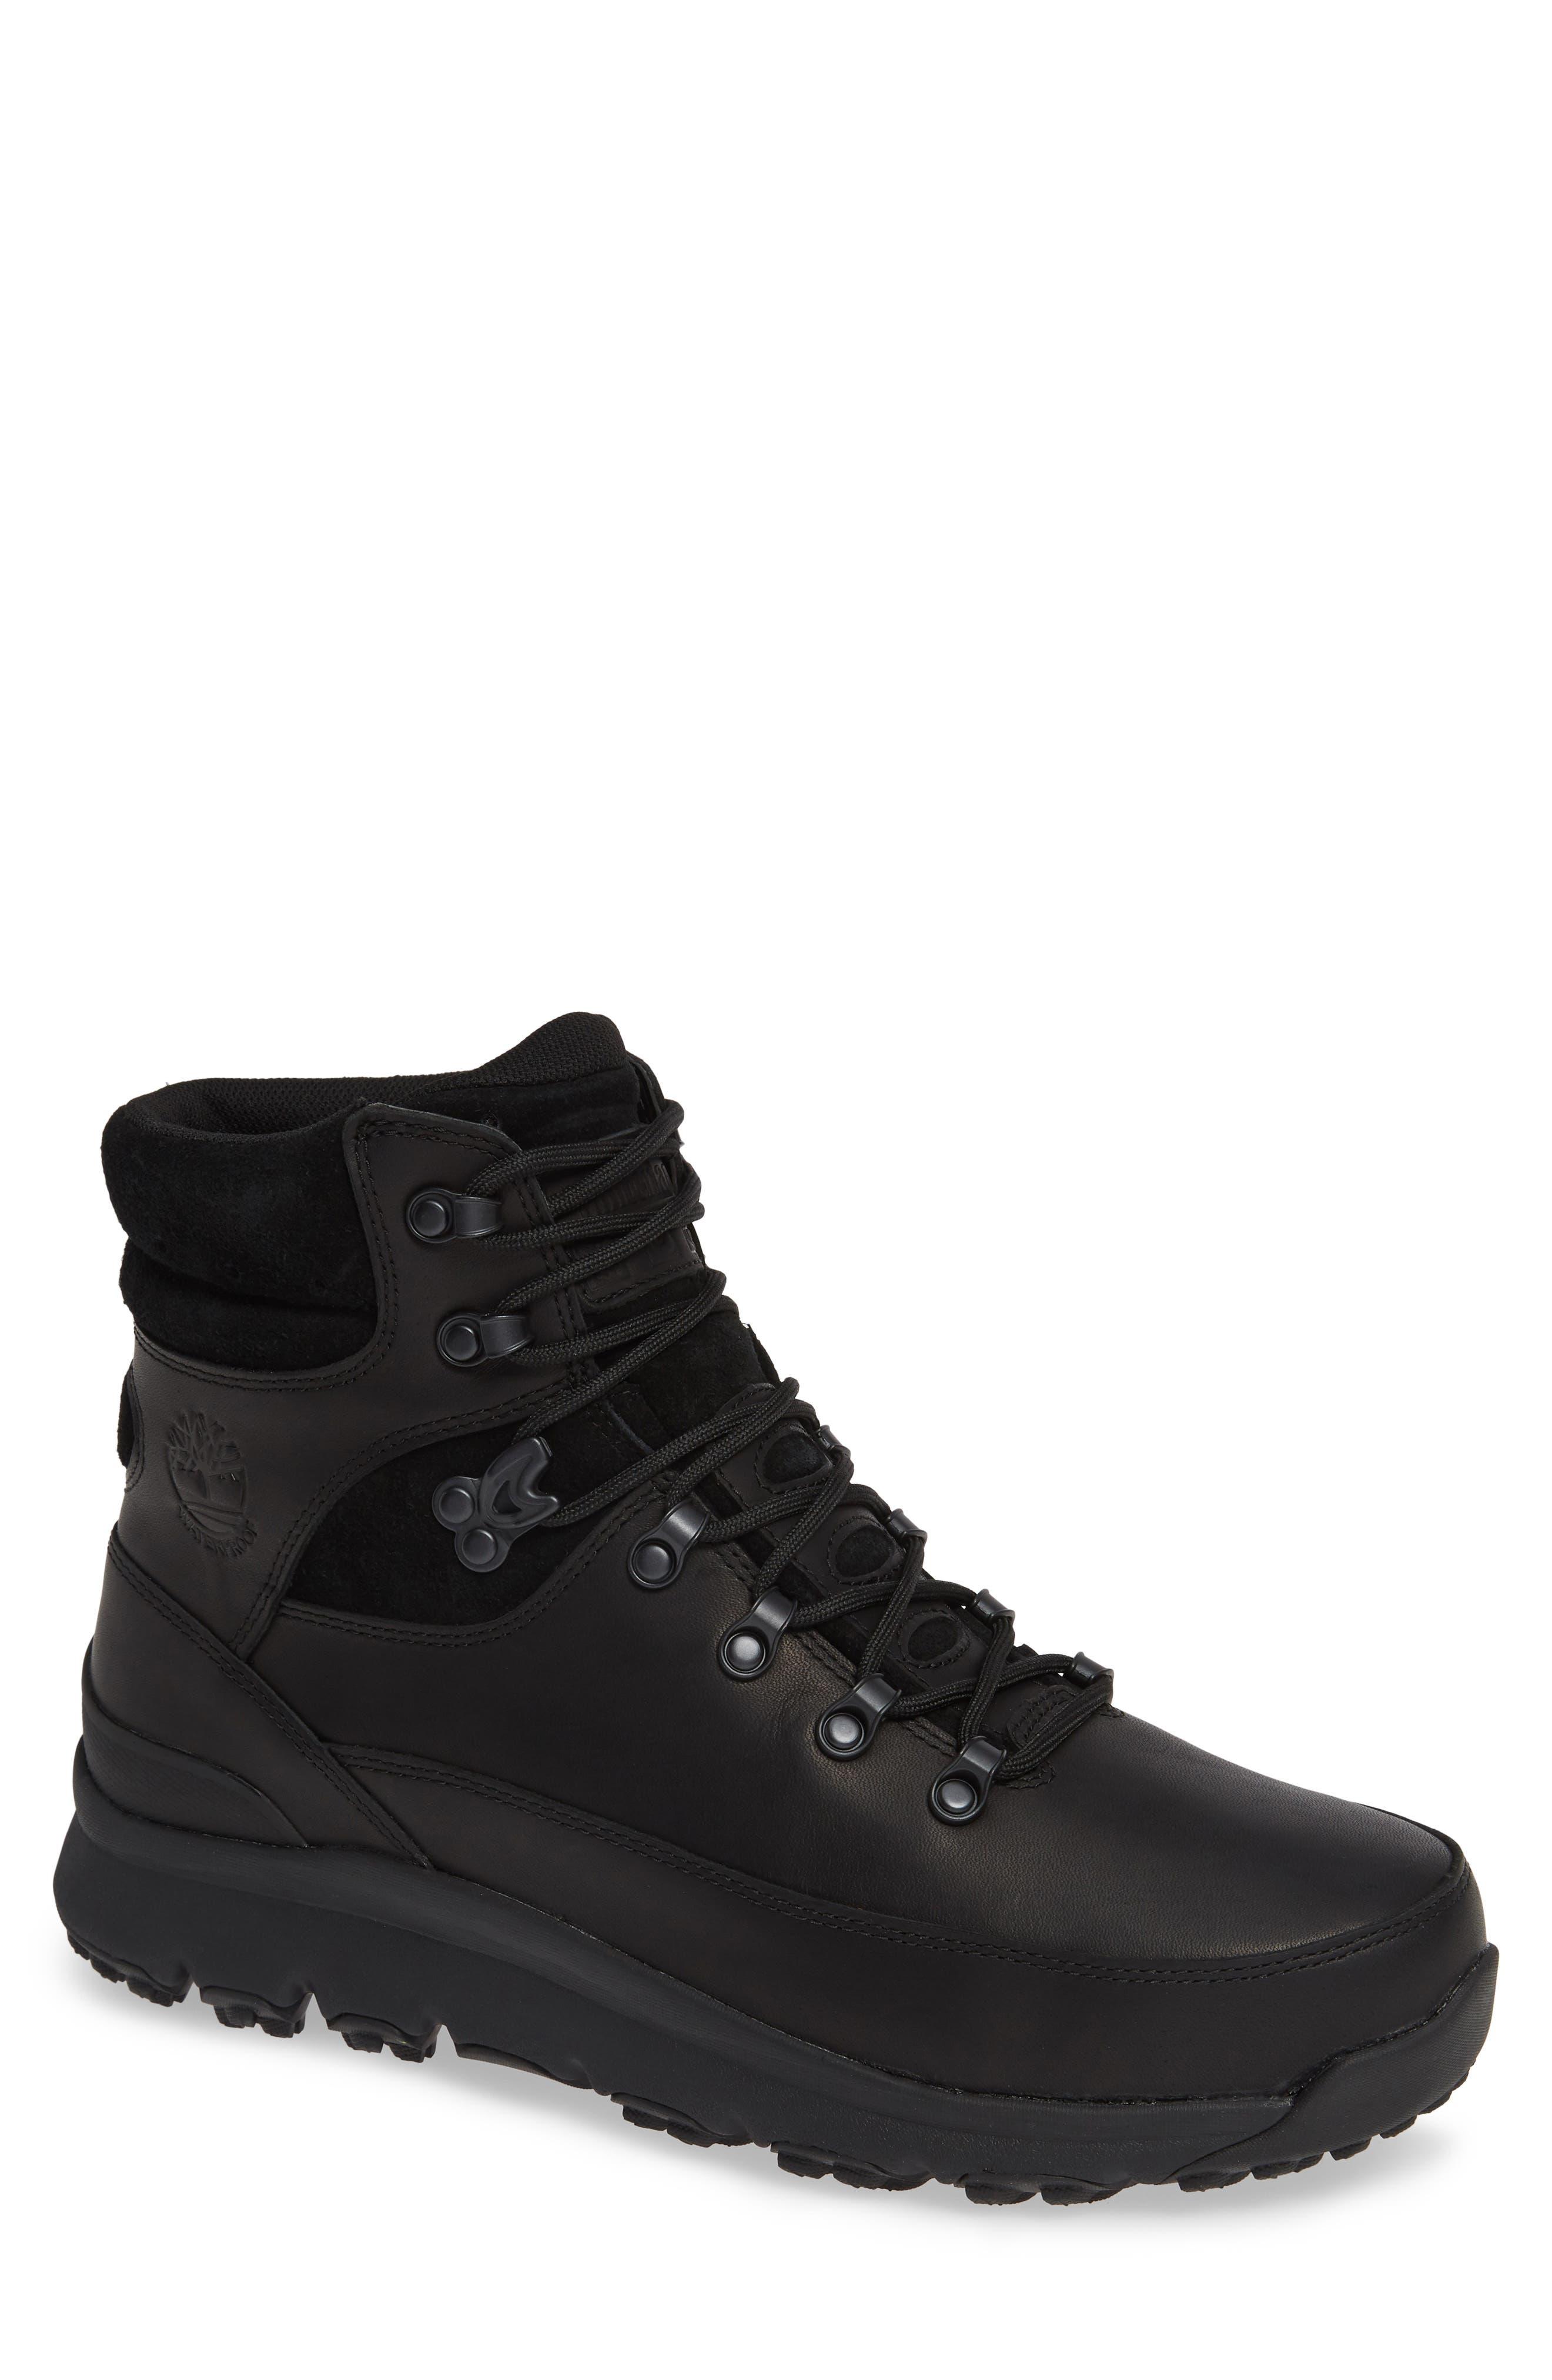 World Hiker Waterproof Boot,                         Main,                         color, 001